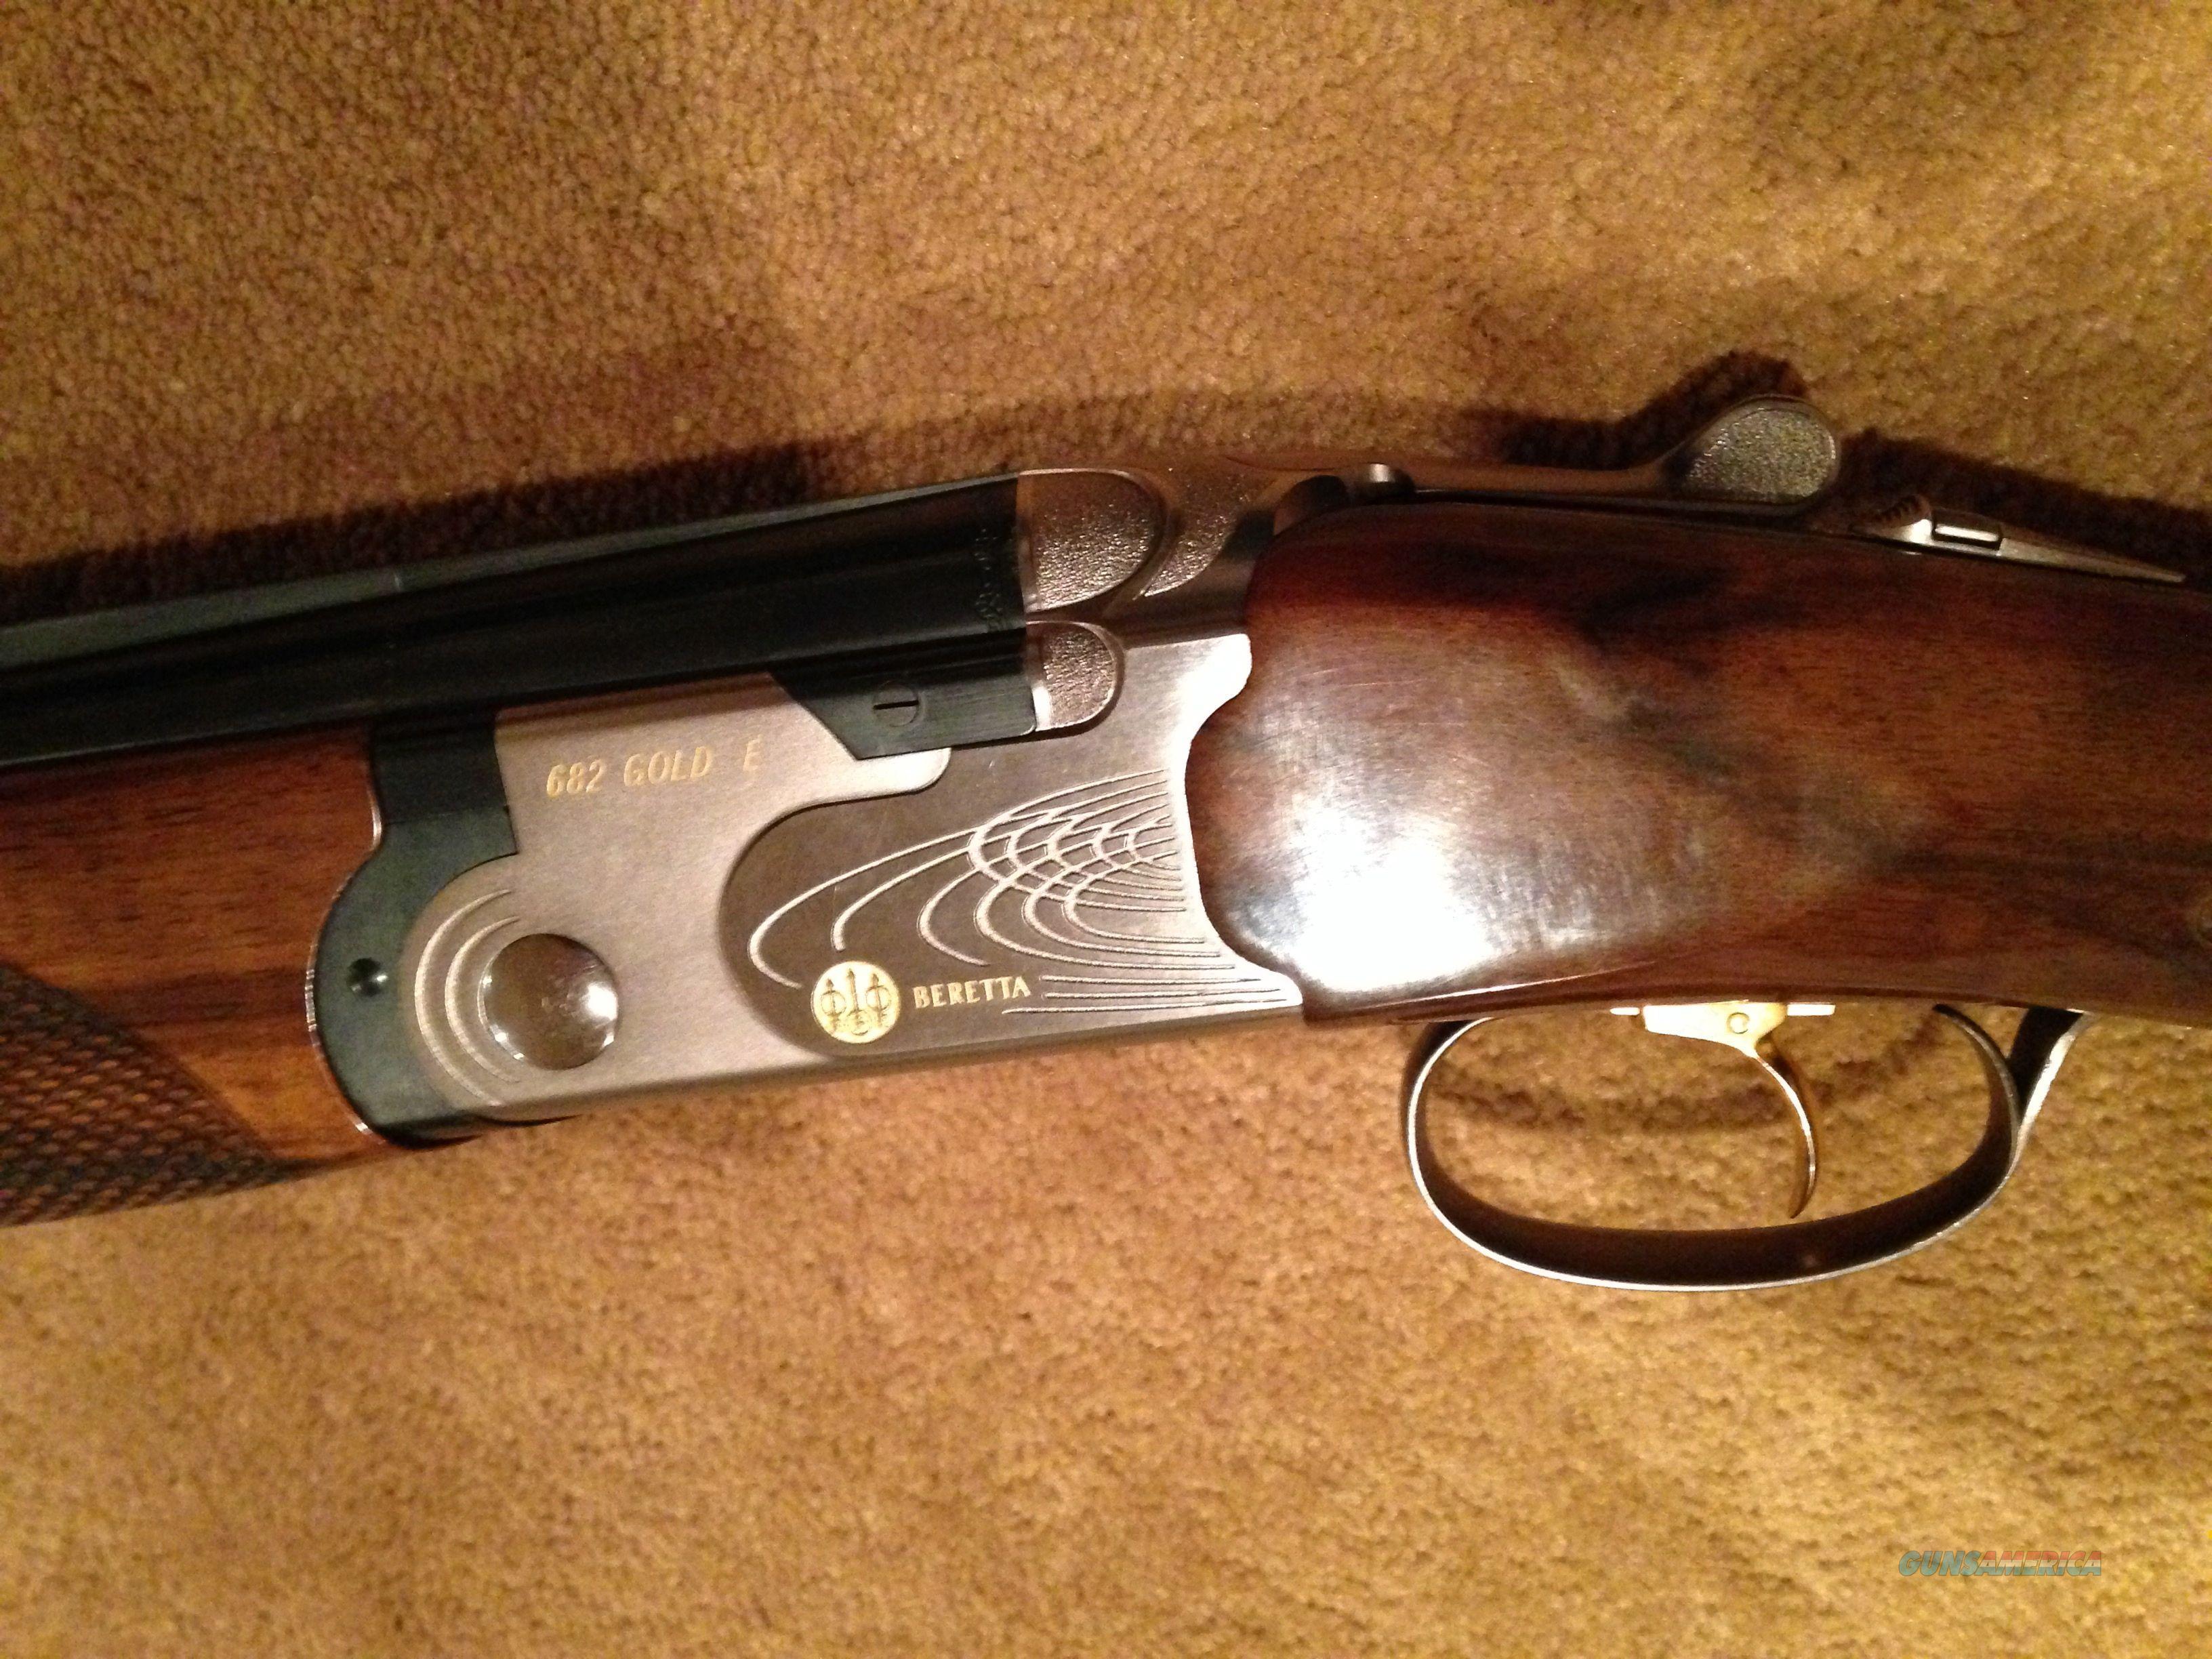 Beretta 682 Gold E Sporting 12 Guage Guns Shotguns O